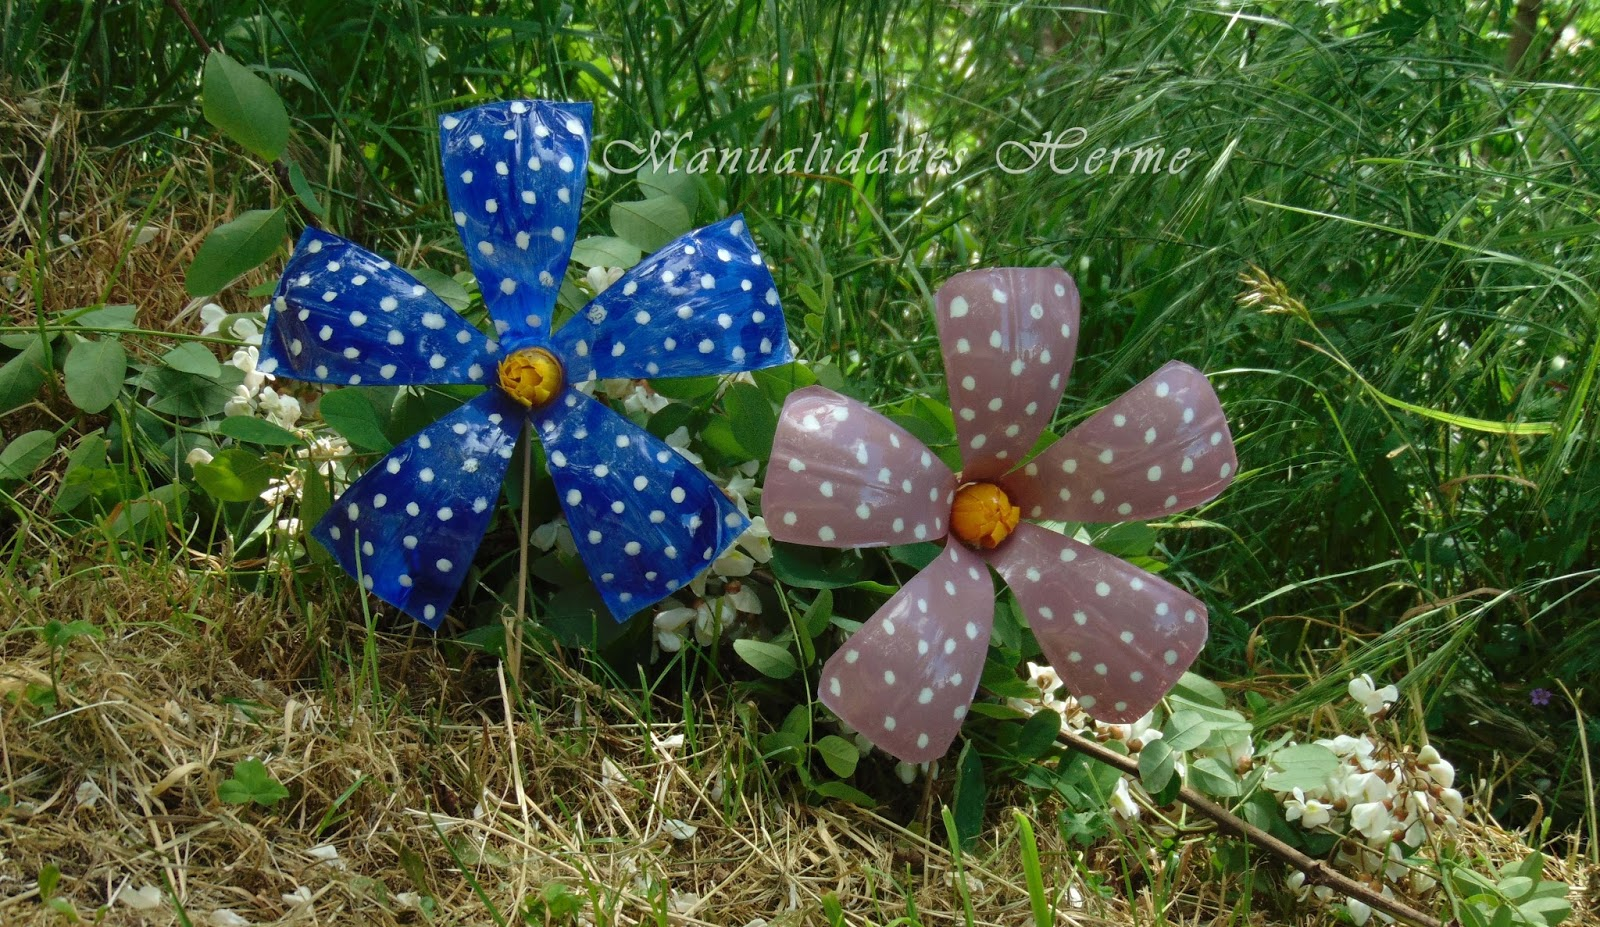 Manualidades herme como hacer flores con botellas for Adornos para jardin caseros